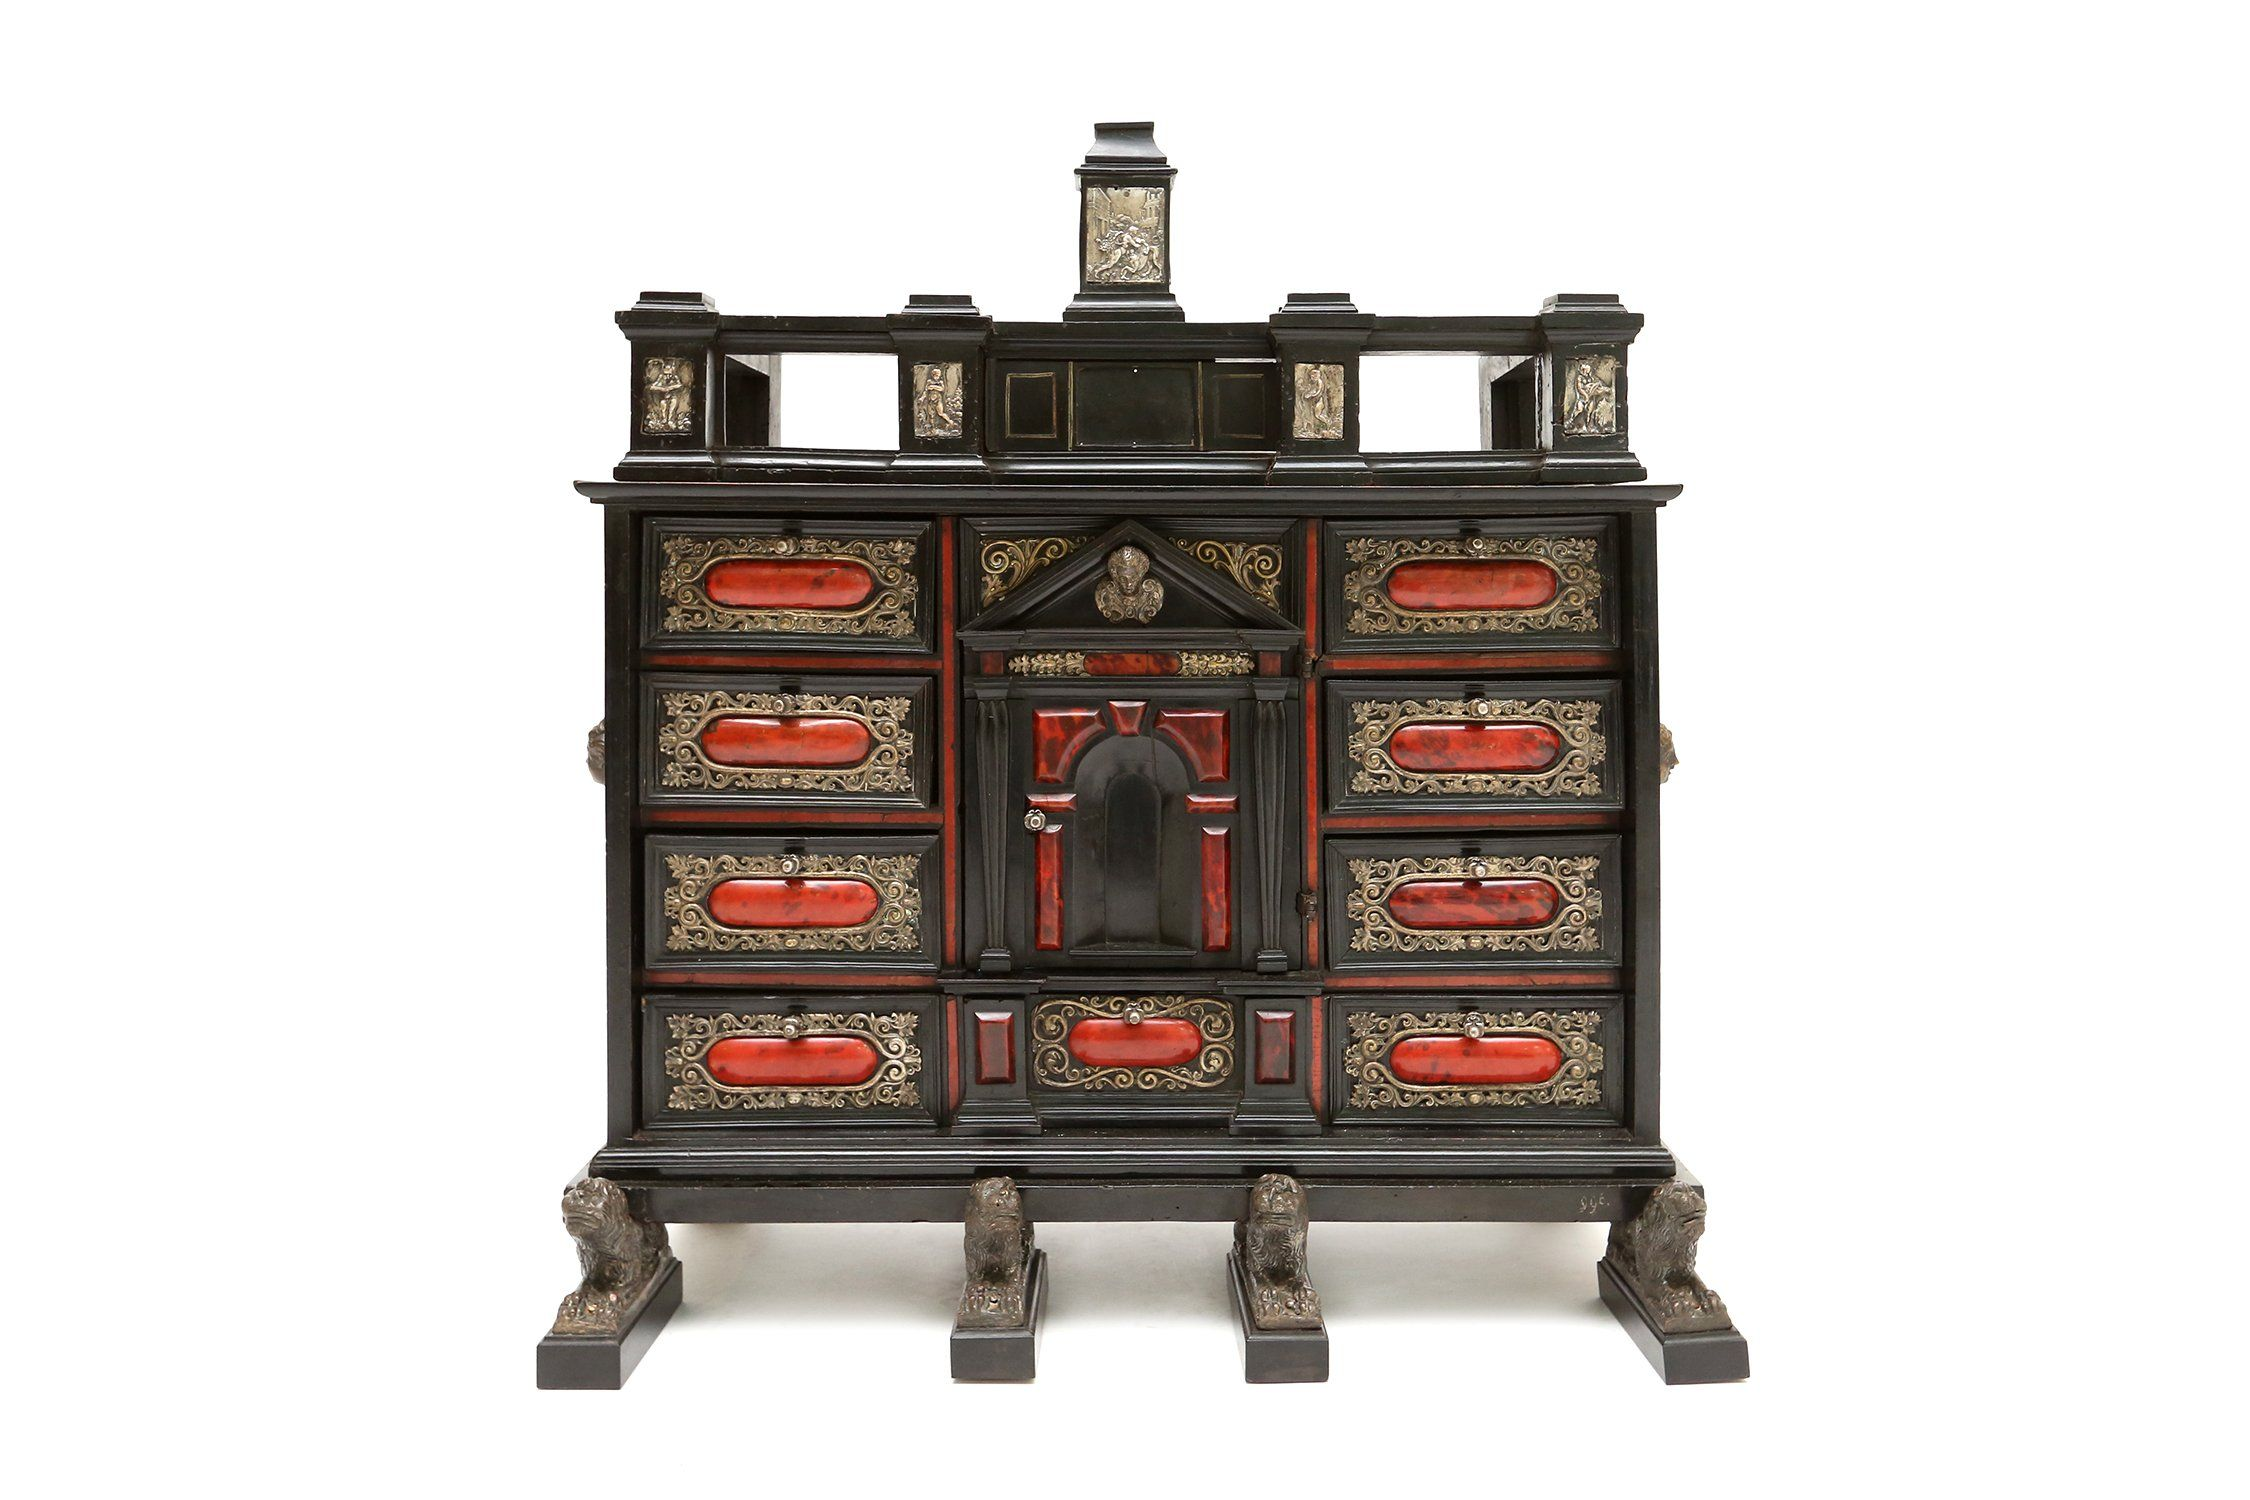 Cabinet XVIII° secolo